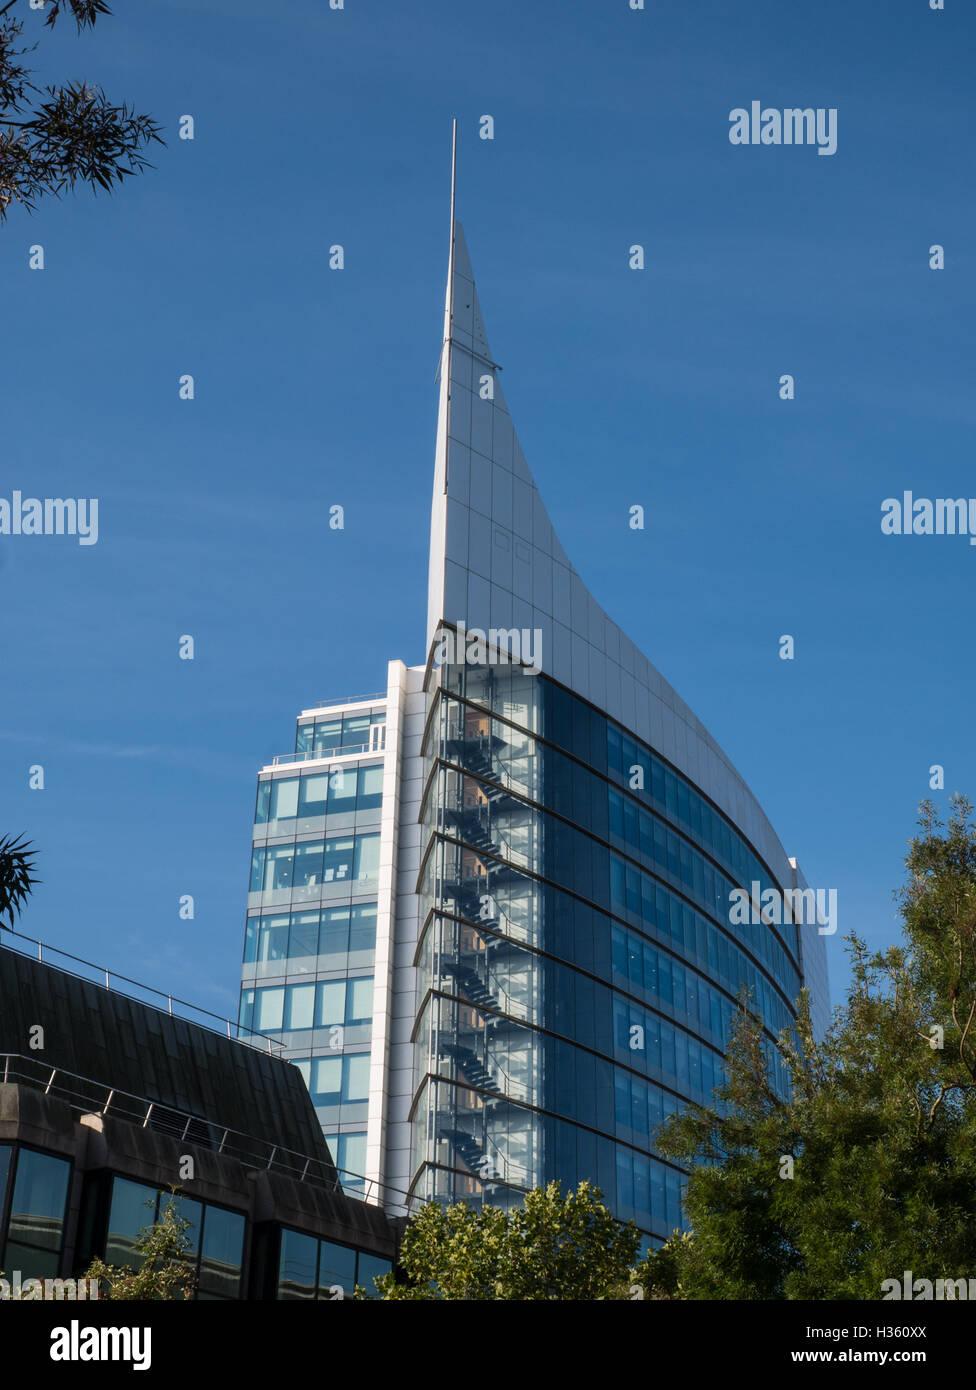 The Blade Building, Reading, Berkshire, England - Stock Image